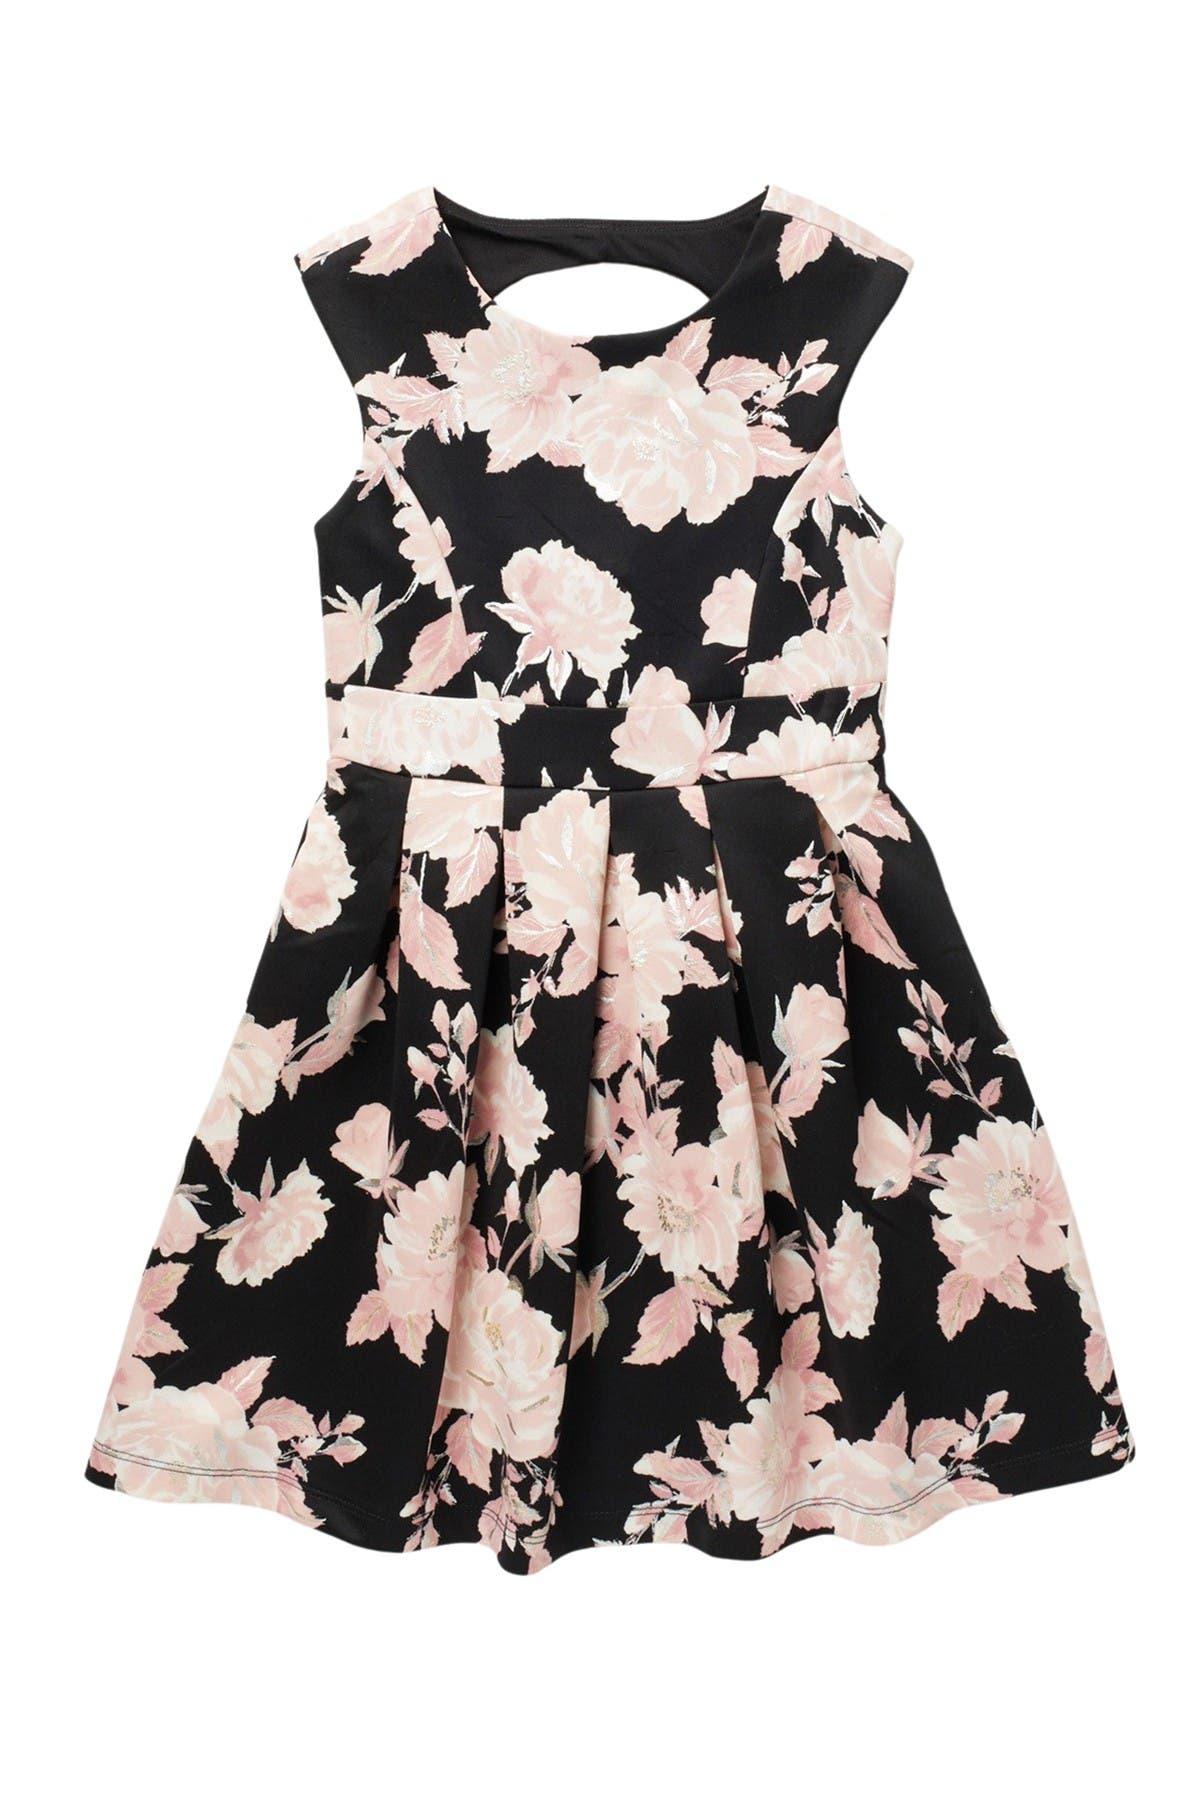 Image of Love, Nickie Lew Floral Foil Cap Sleeve Dress